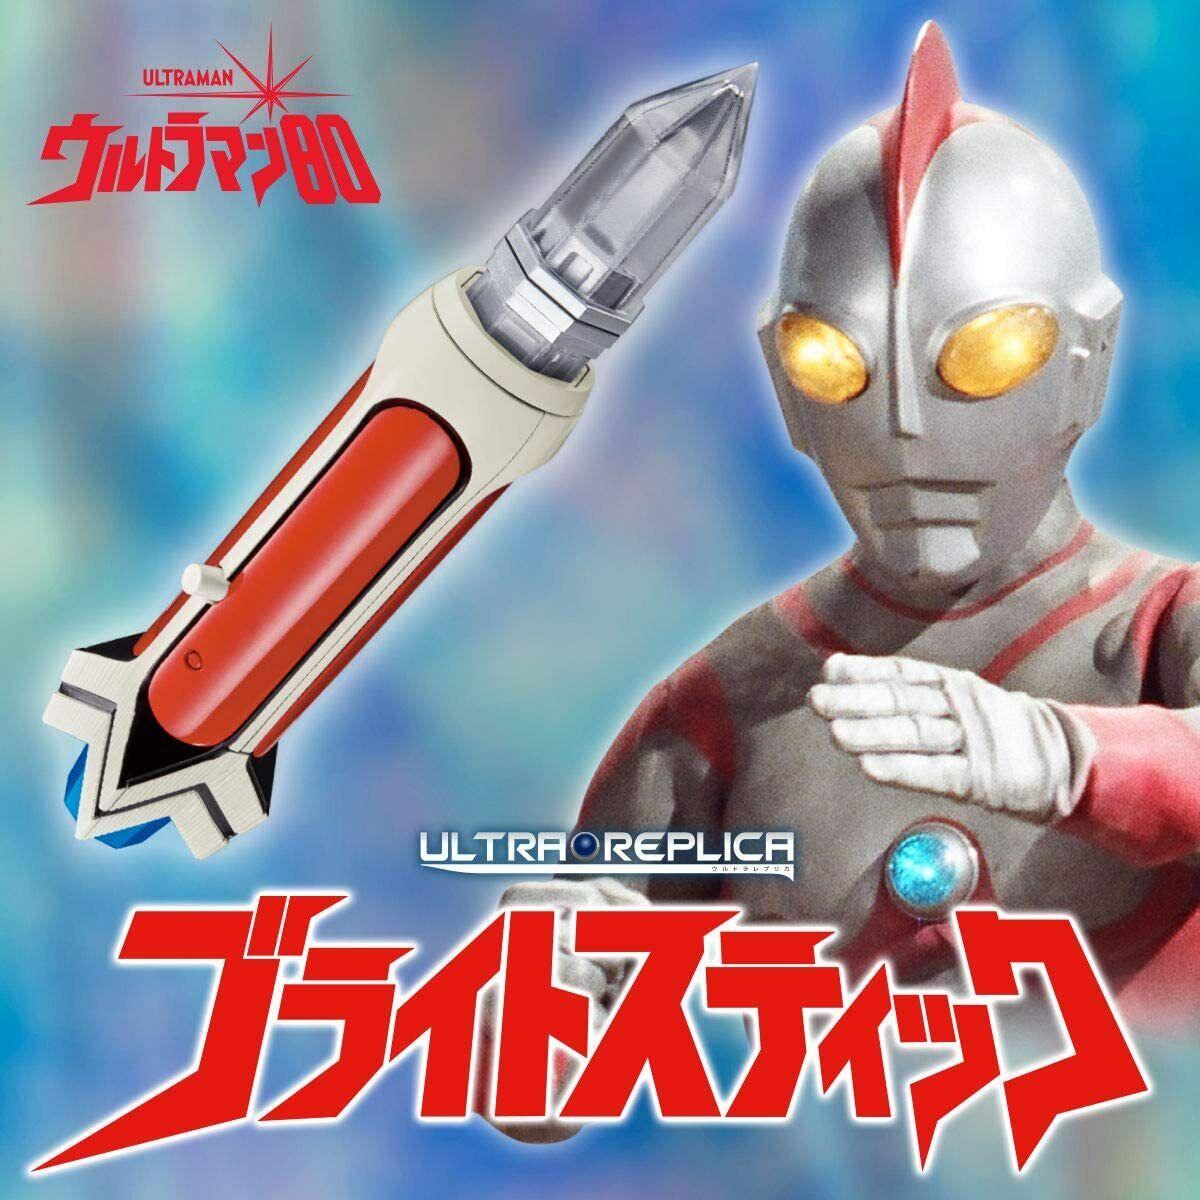 PRE Ultra Replica Ultra Zero Eye /& Ultra Bracelet Premium Bandai Ultraman Zero